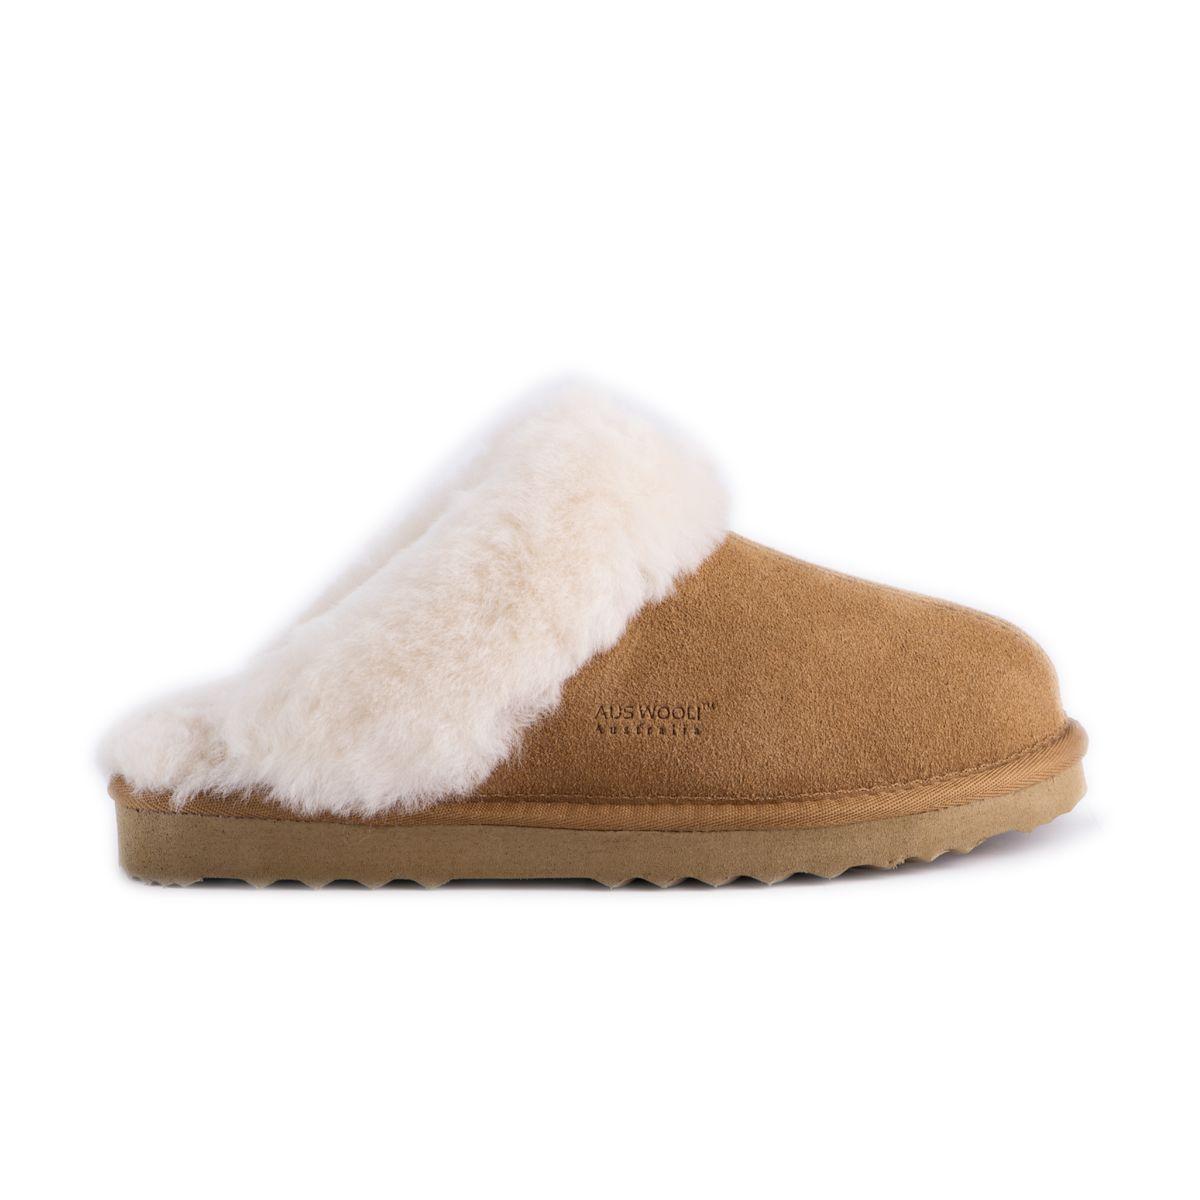 "Aus Wooli ""Sydney"" Australia Sheepskin Wool Slippers, Tan"